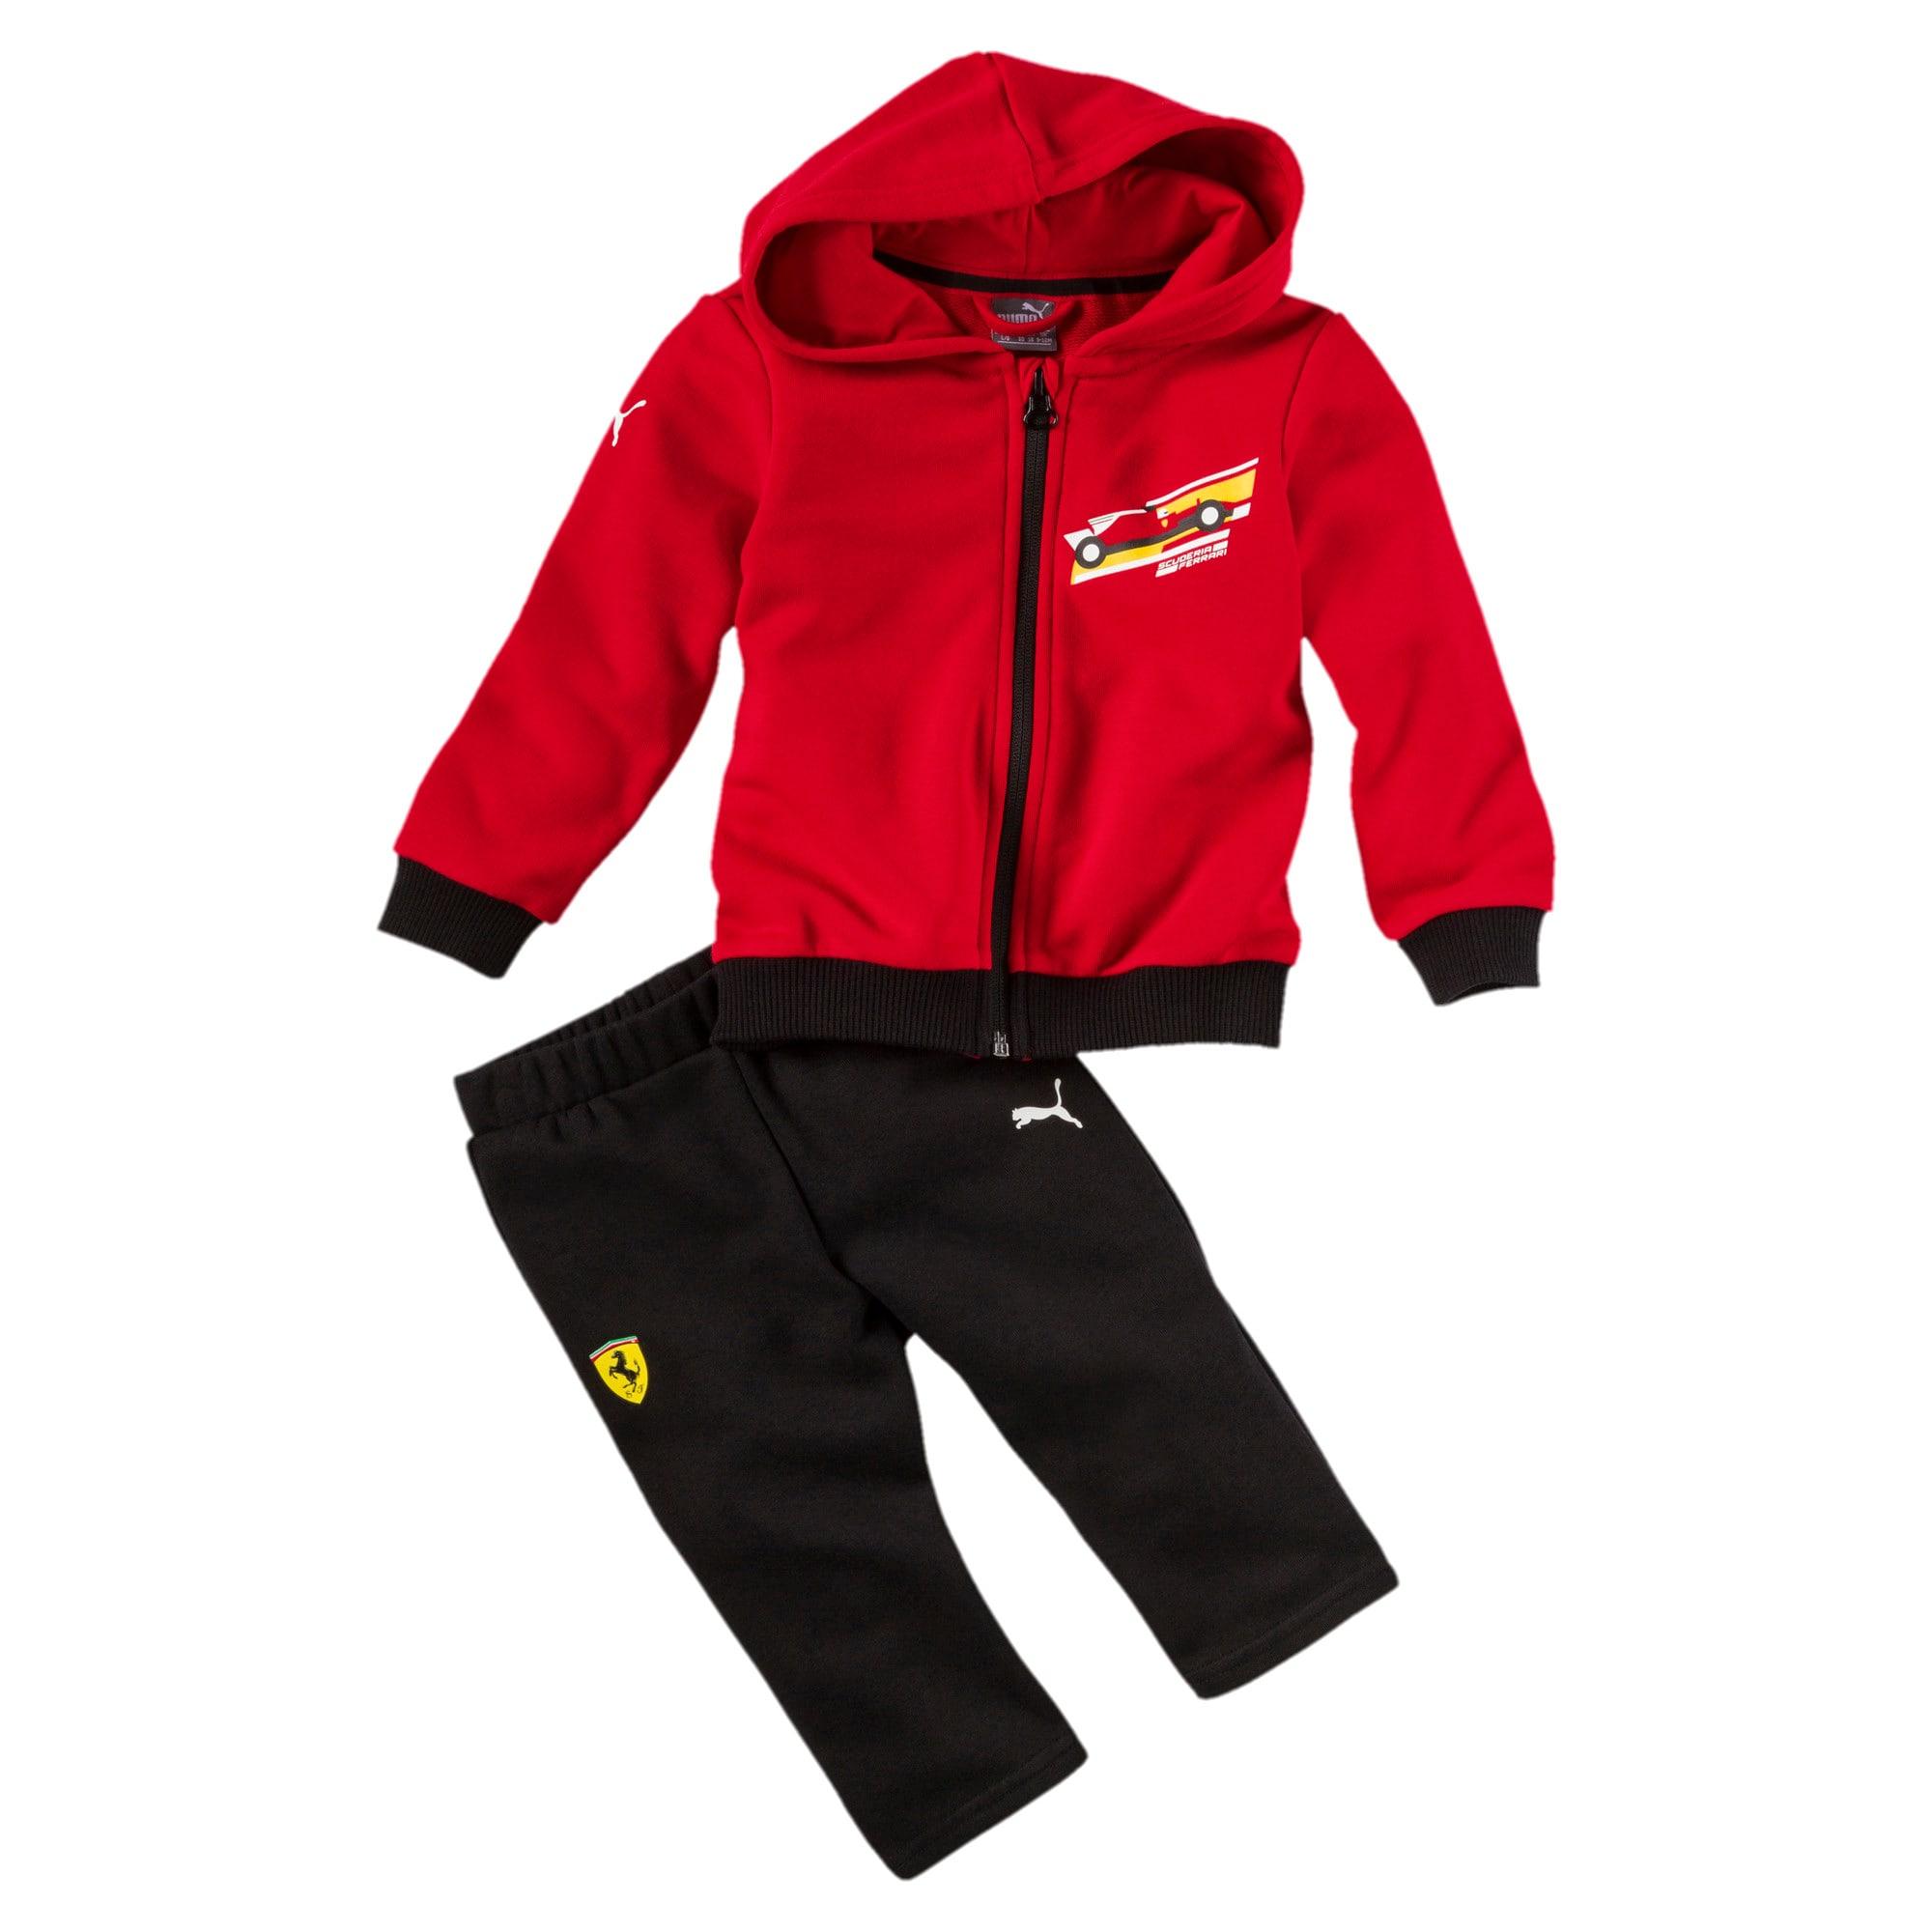 Thumbnail 1 of Ferrari Baby Jogger Set, Rosso Corsa, medium-SEA